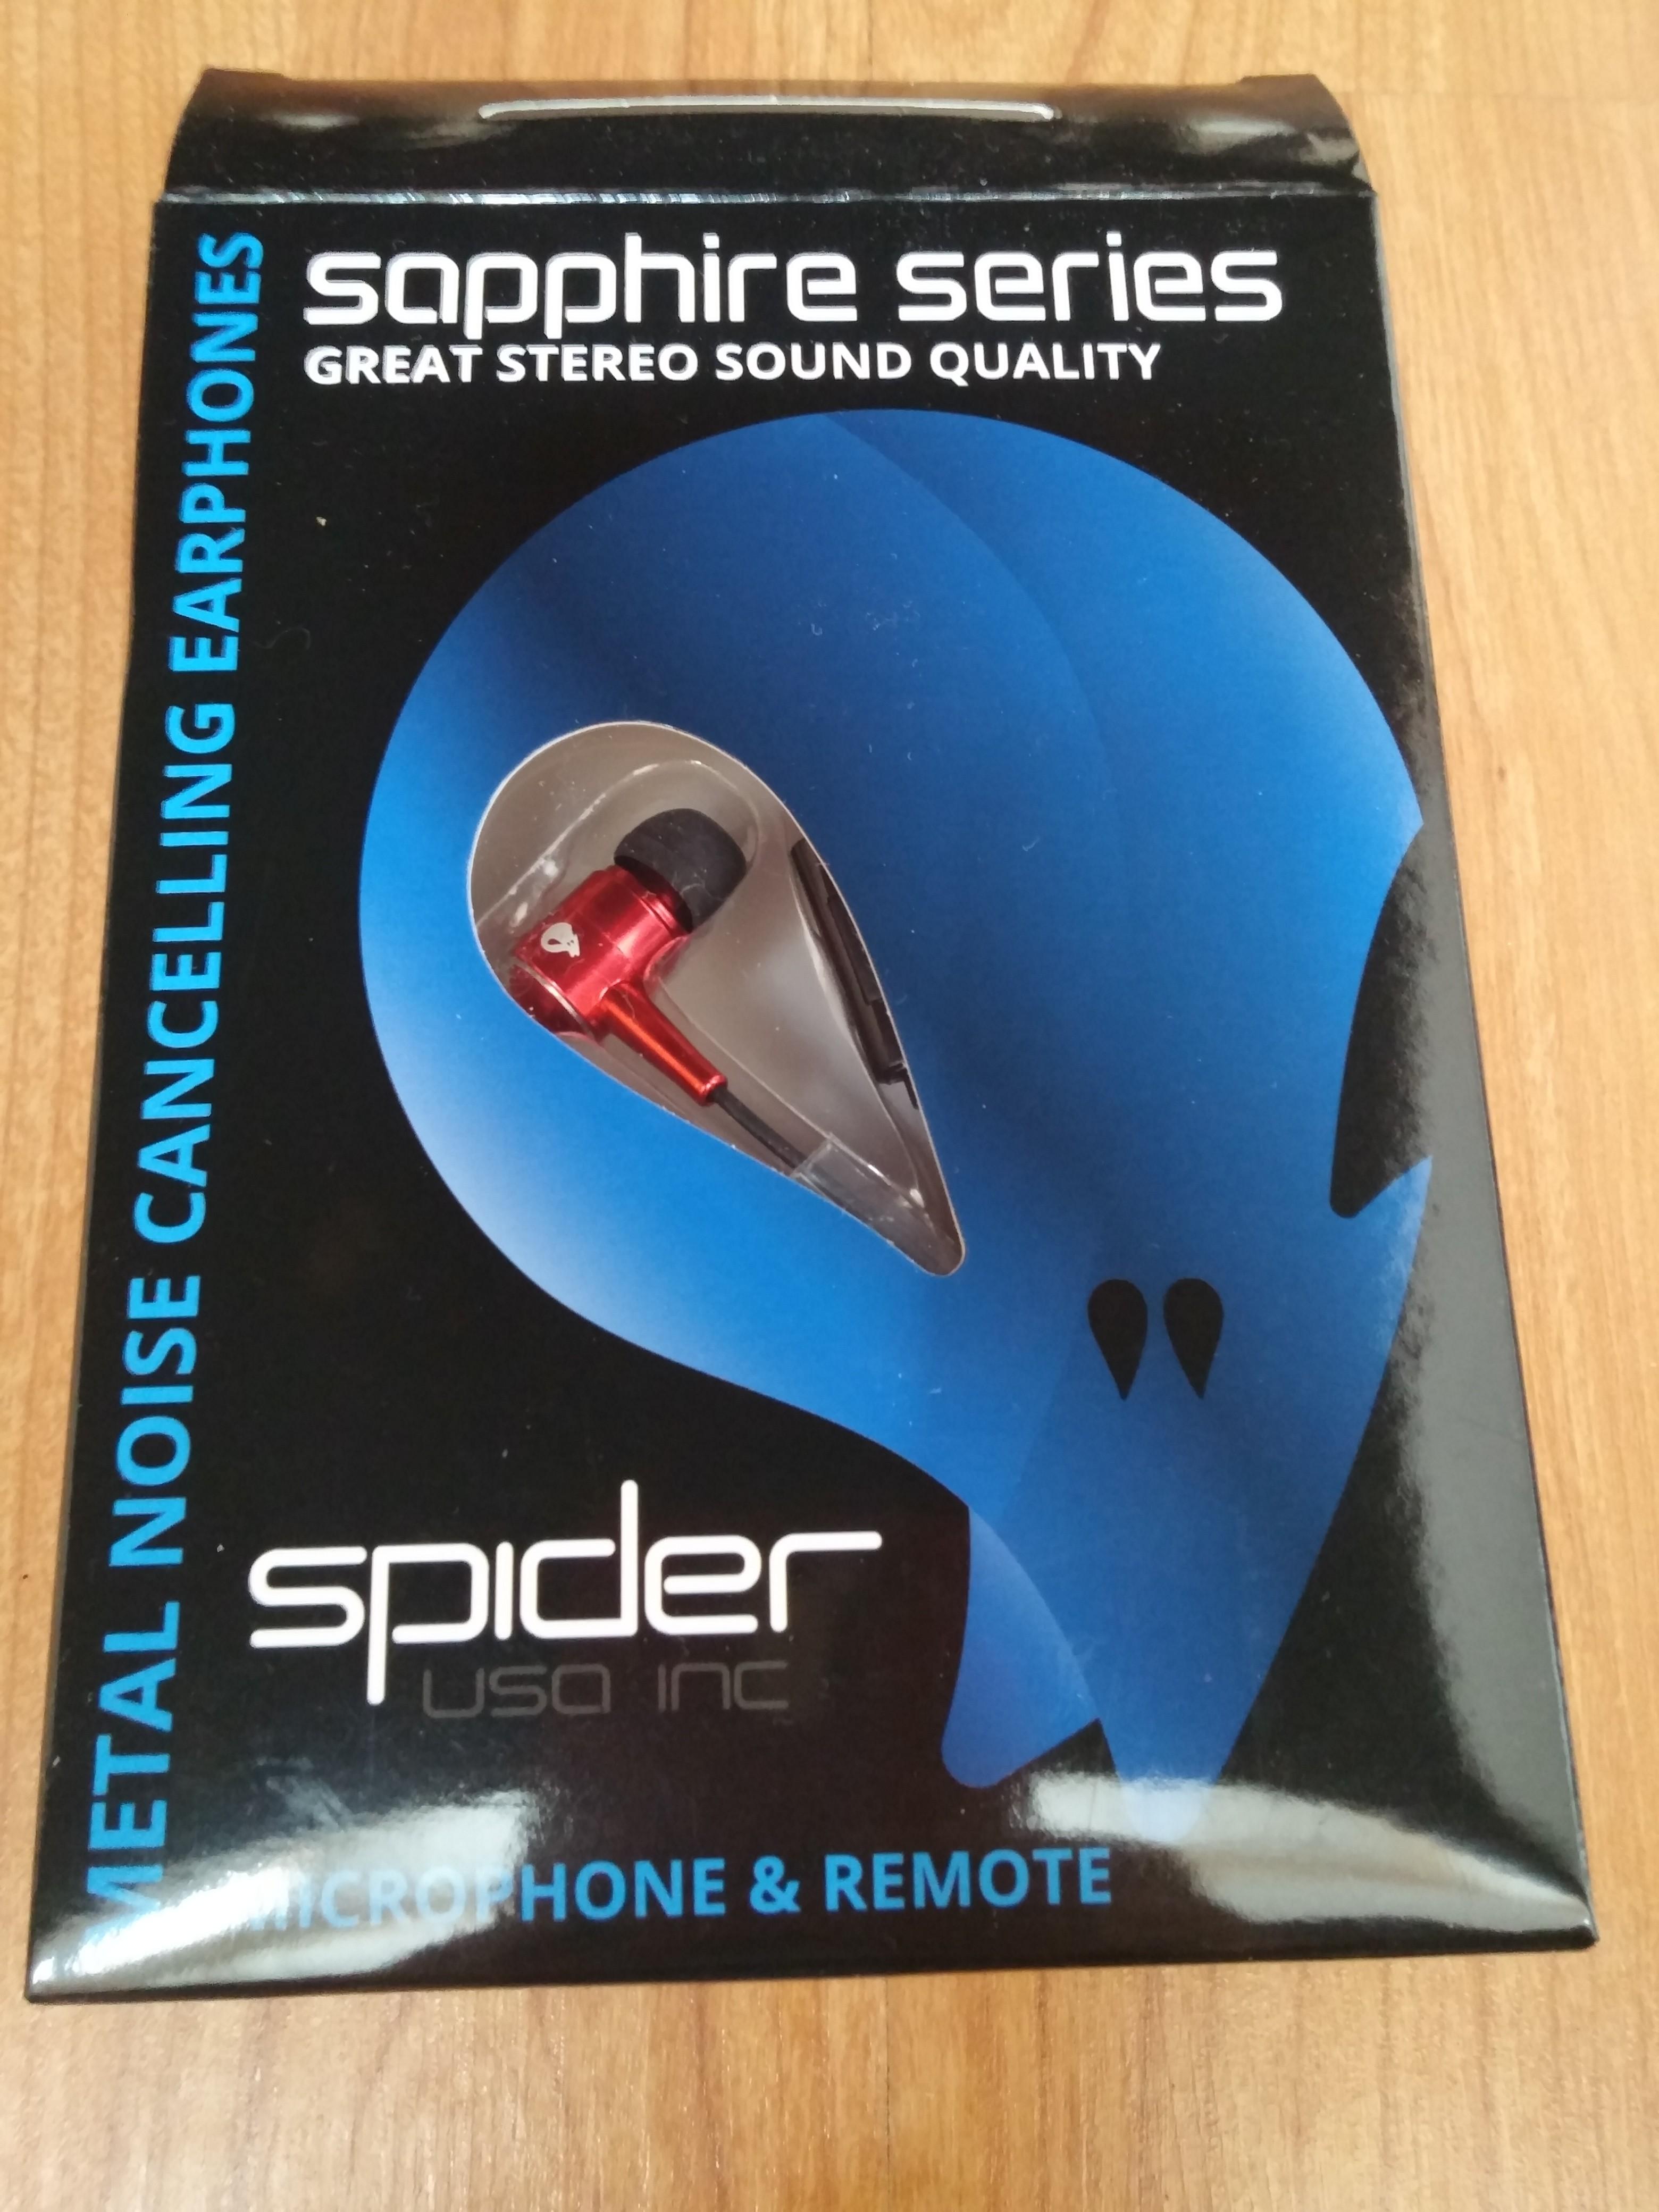 spiderbud earbuds